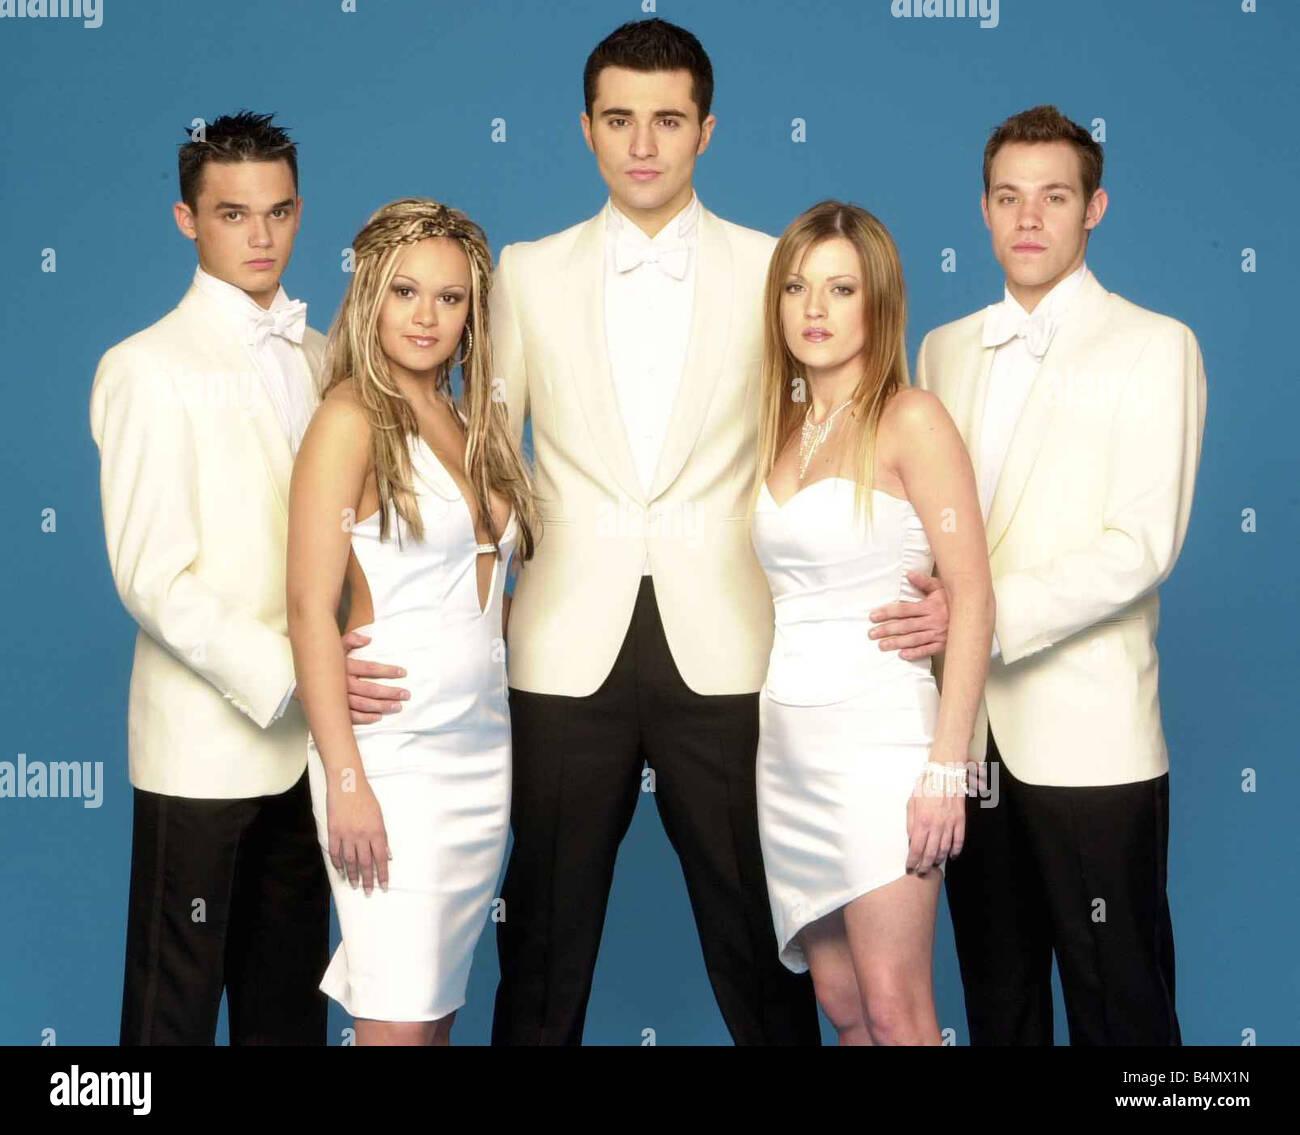 Pop Idol Finalists February 2002 left to right Gareth Gates Zoe Birkett Darius Danesh Hayley Evetts and Will Young - Stock Image